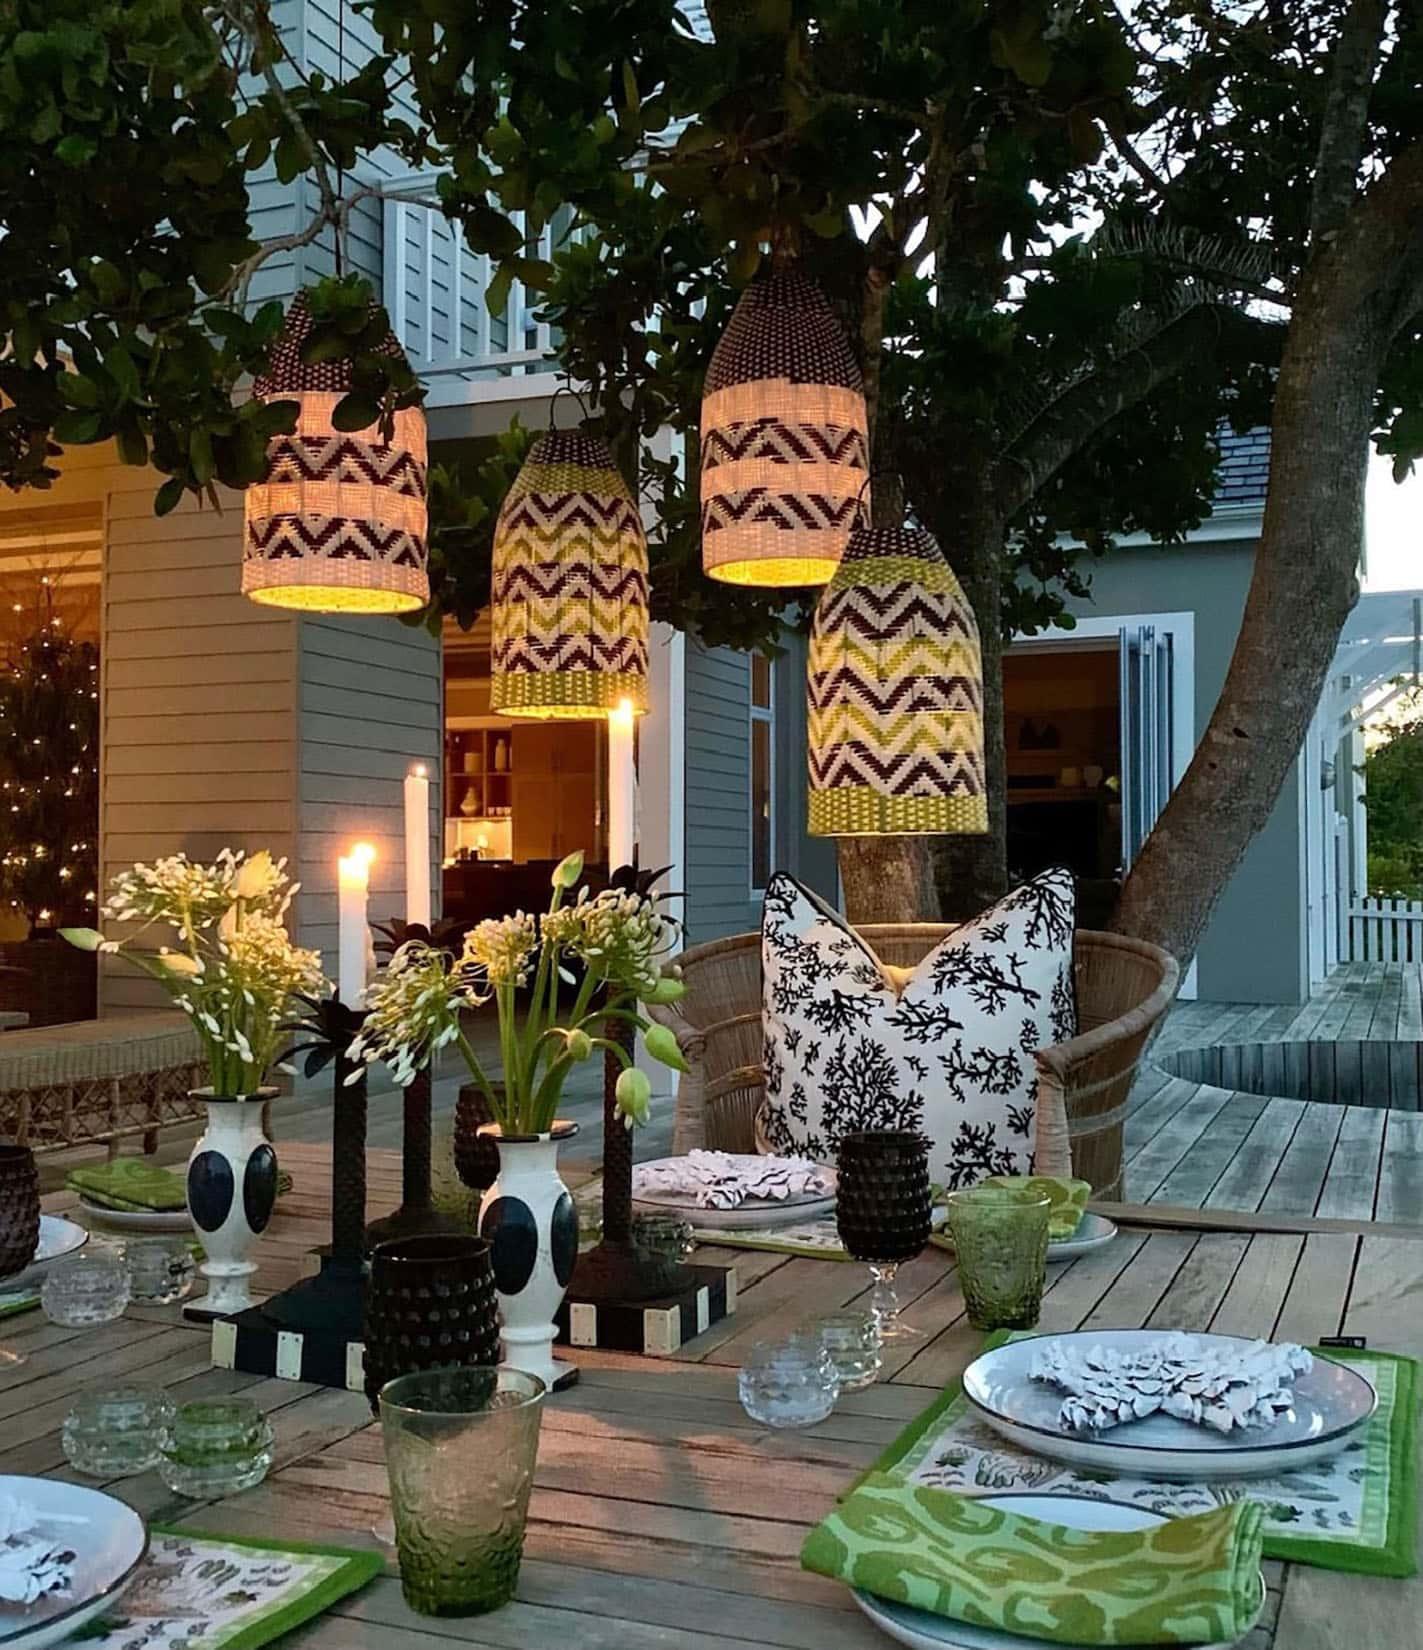 sue bond's south african veranda at night